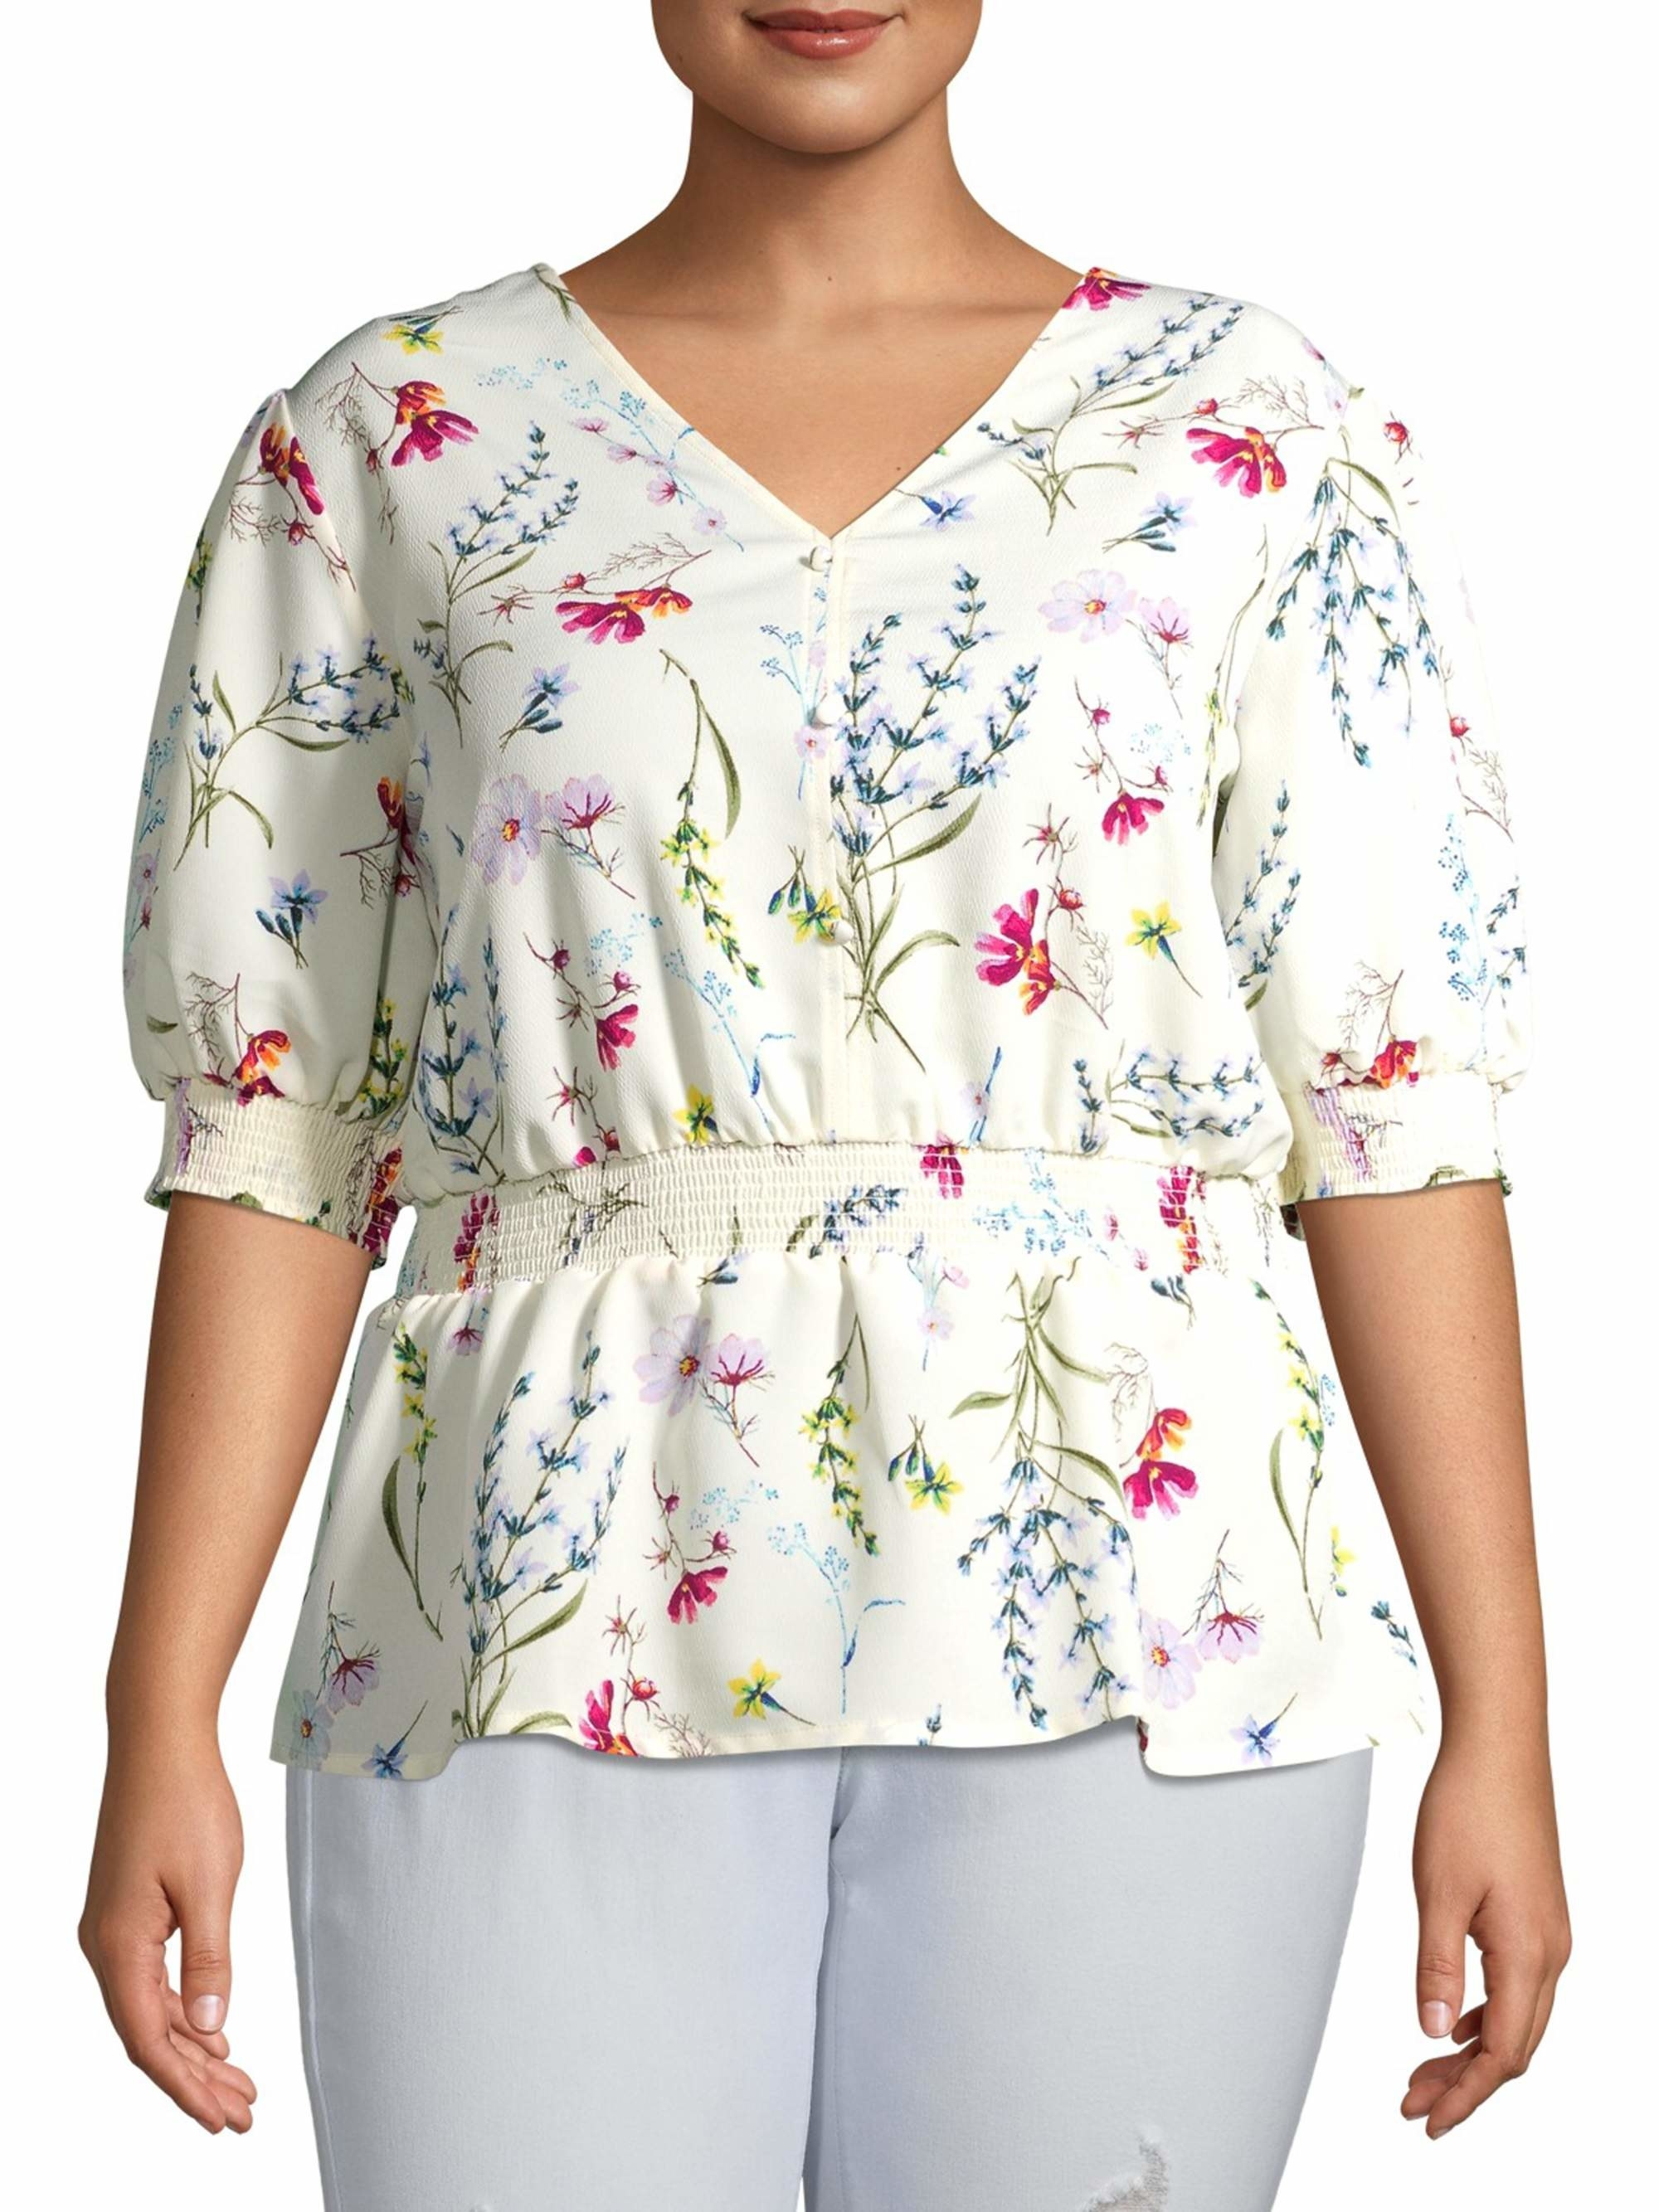 Model wearing floral blouse